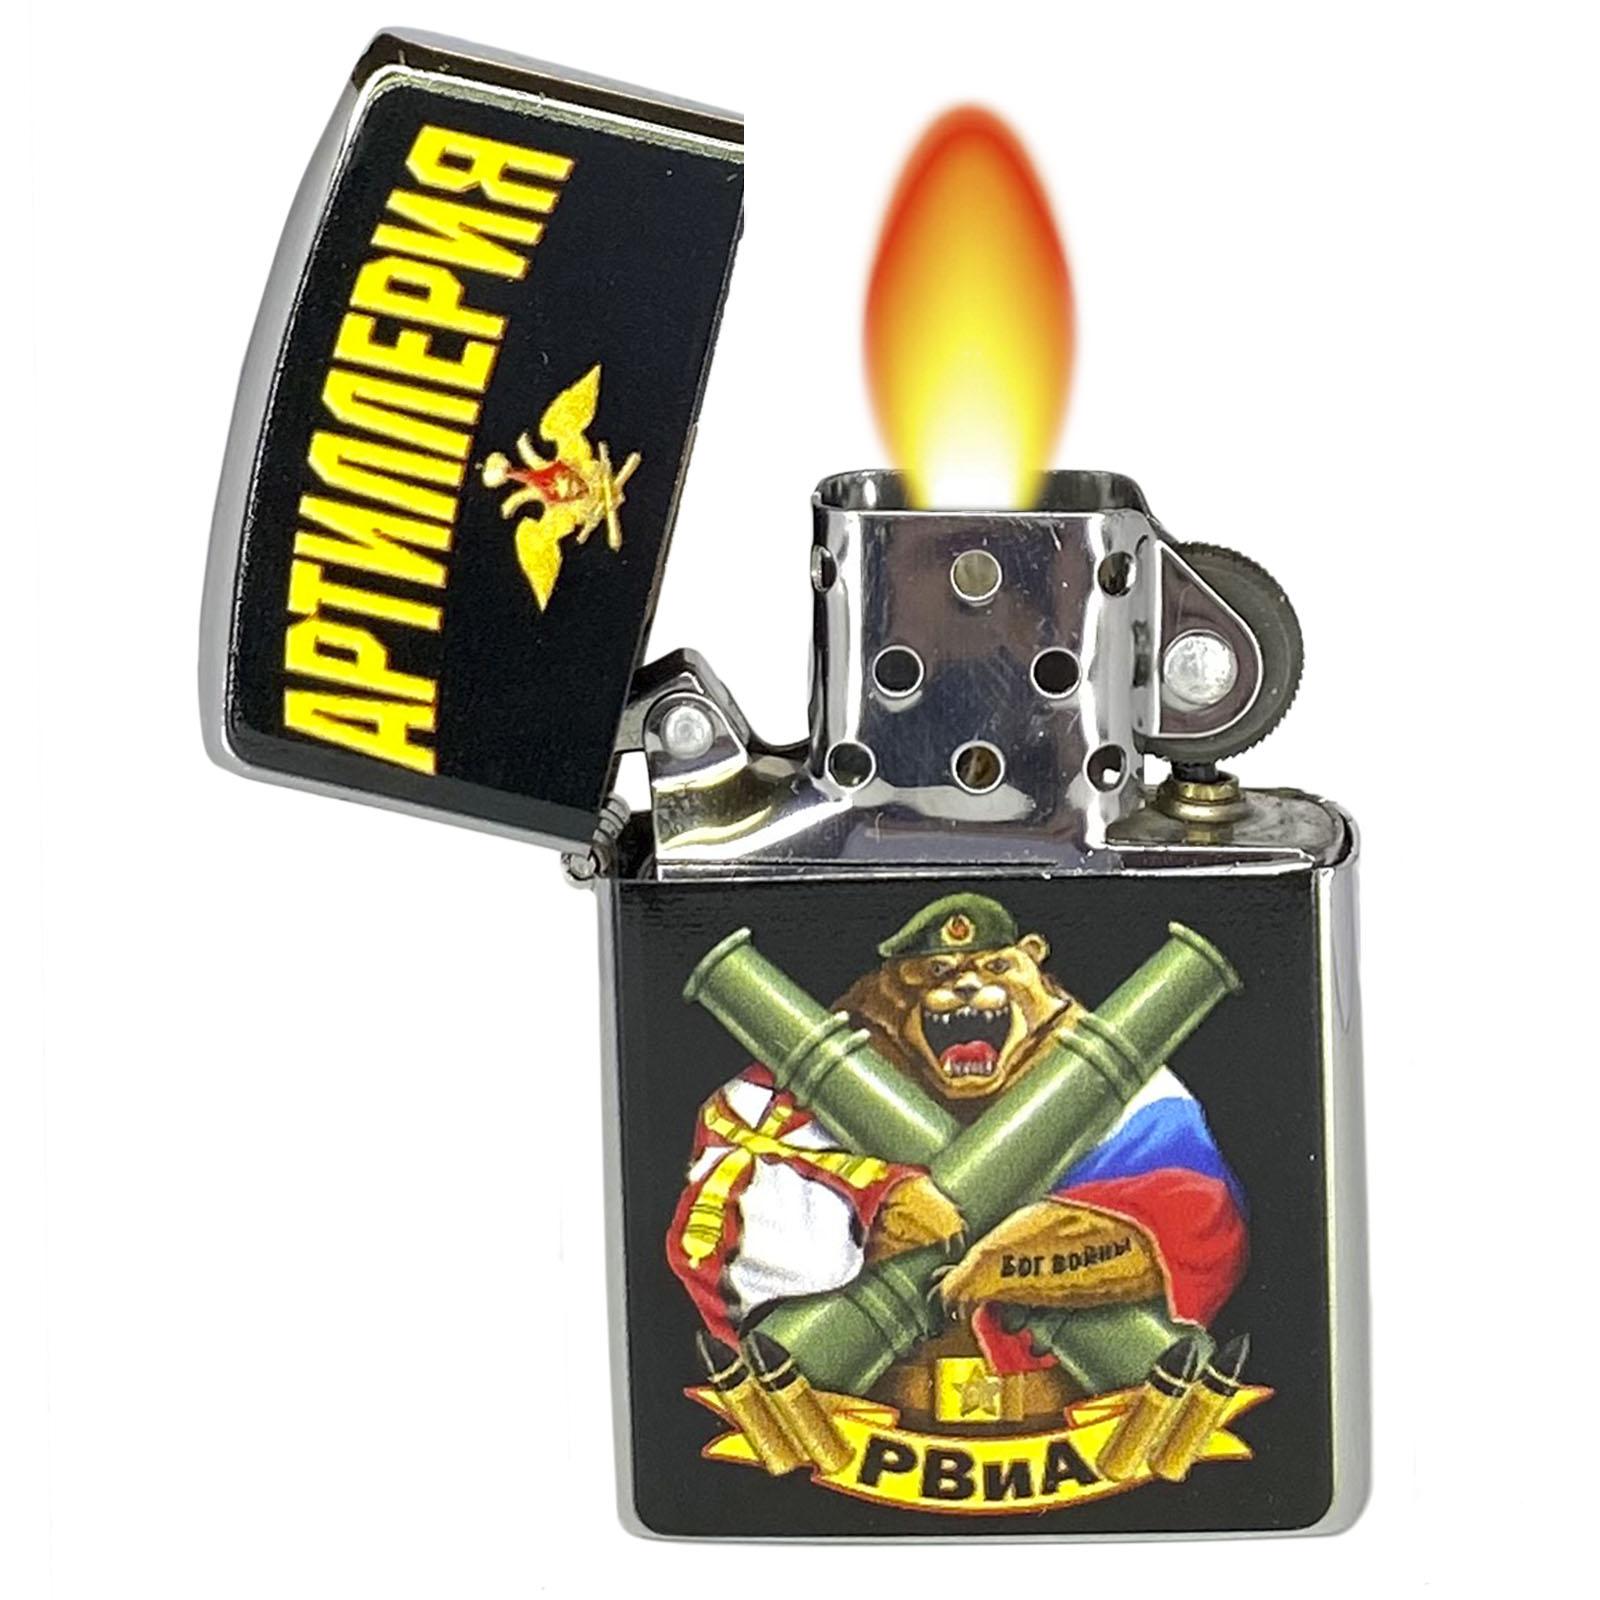 Купить зажигалку РВиА онлайн